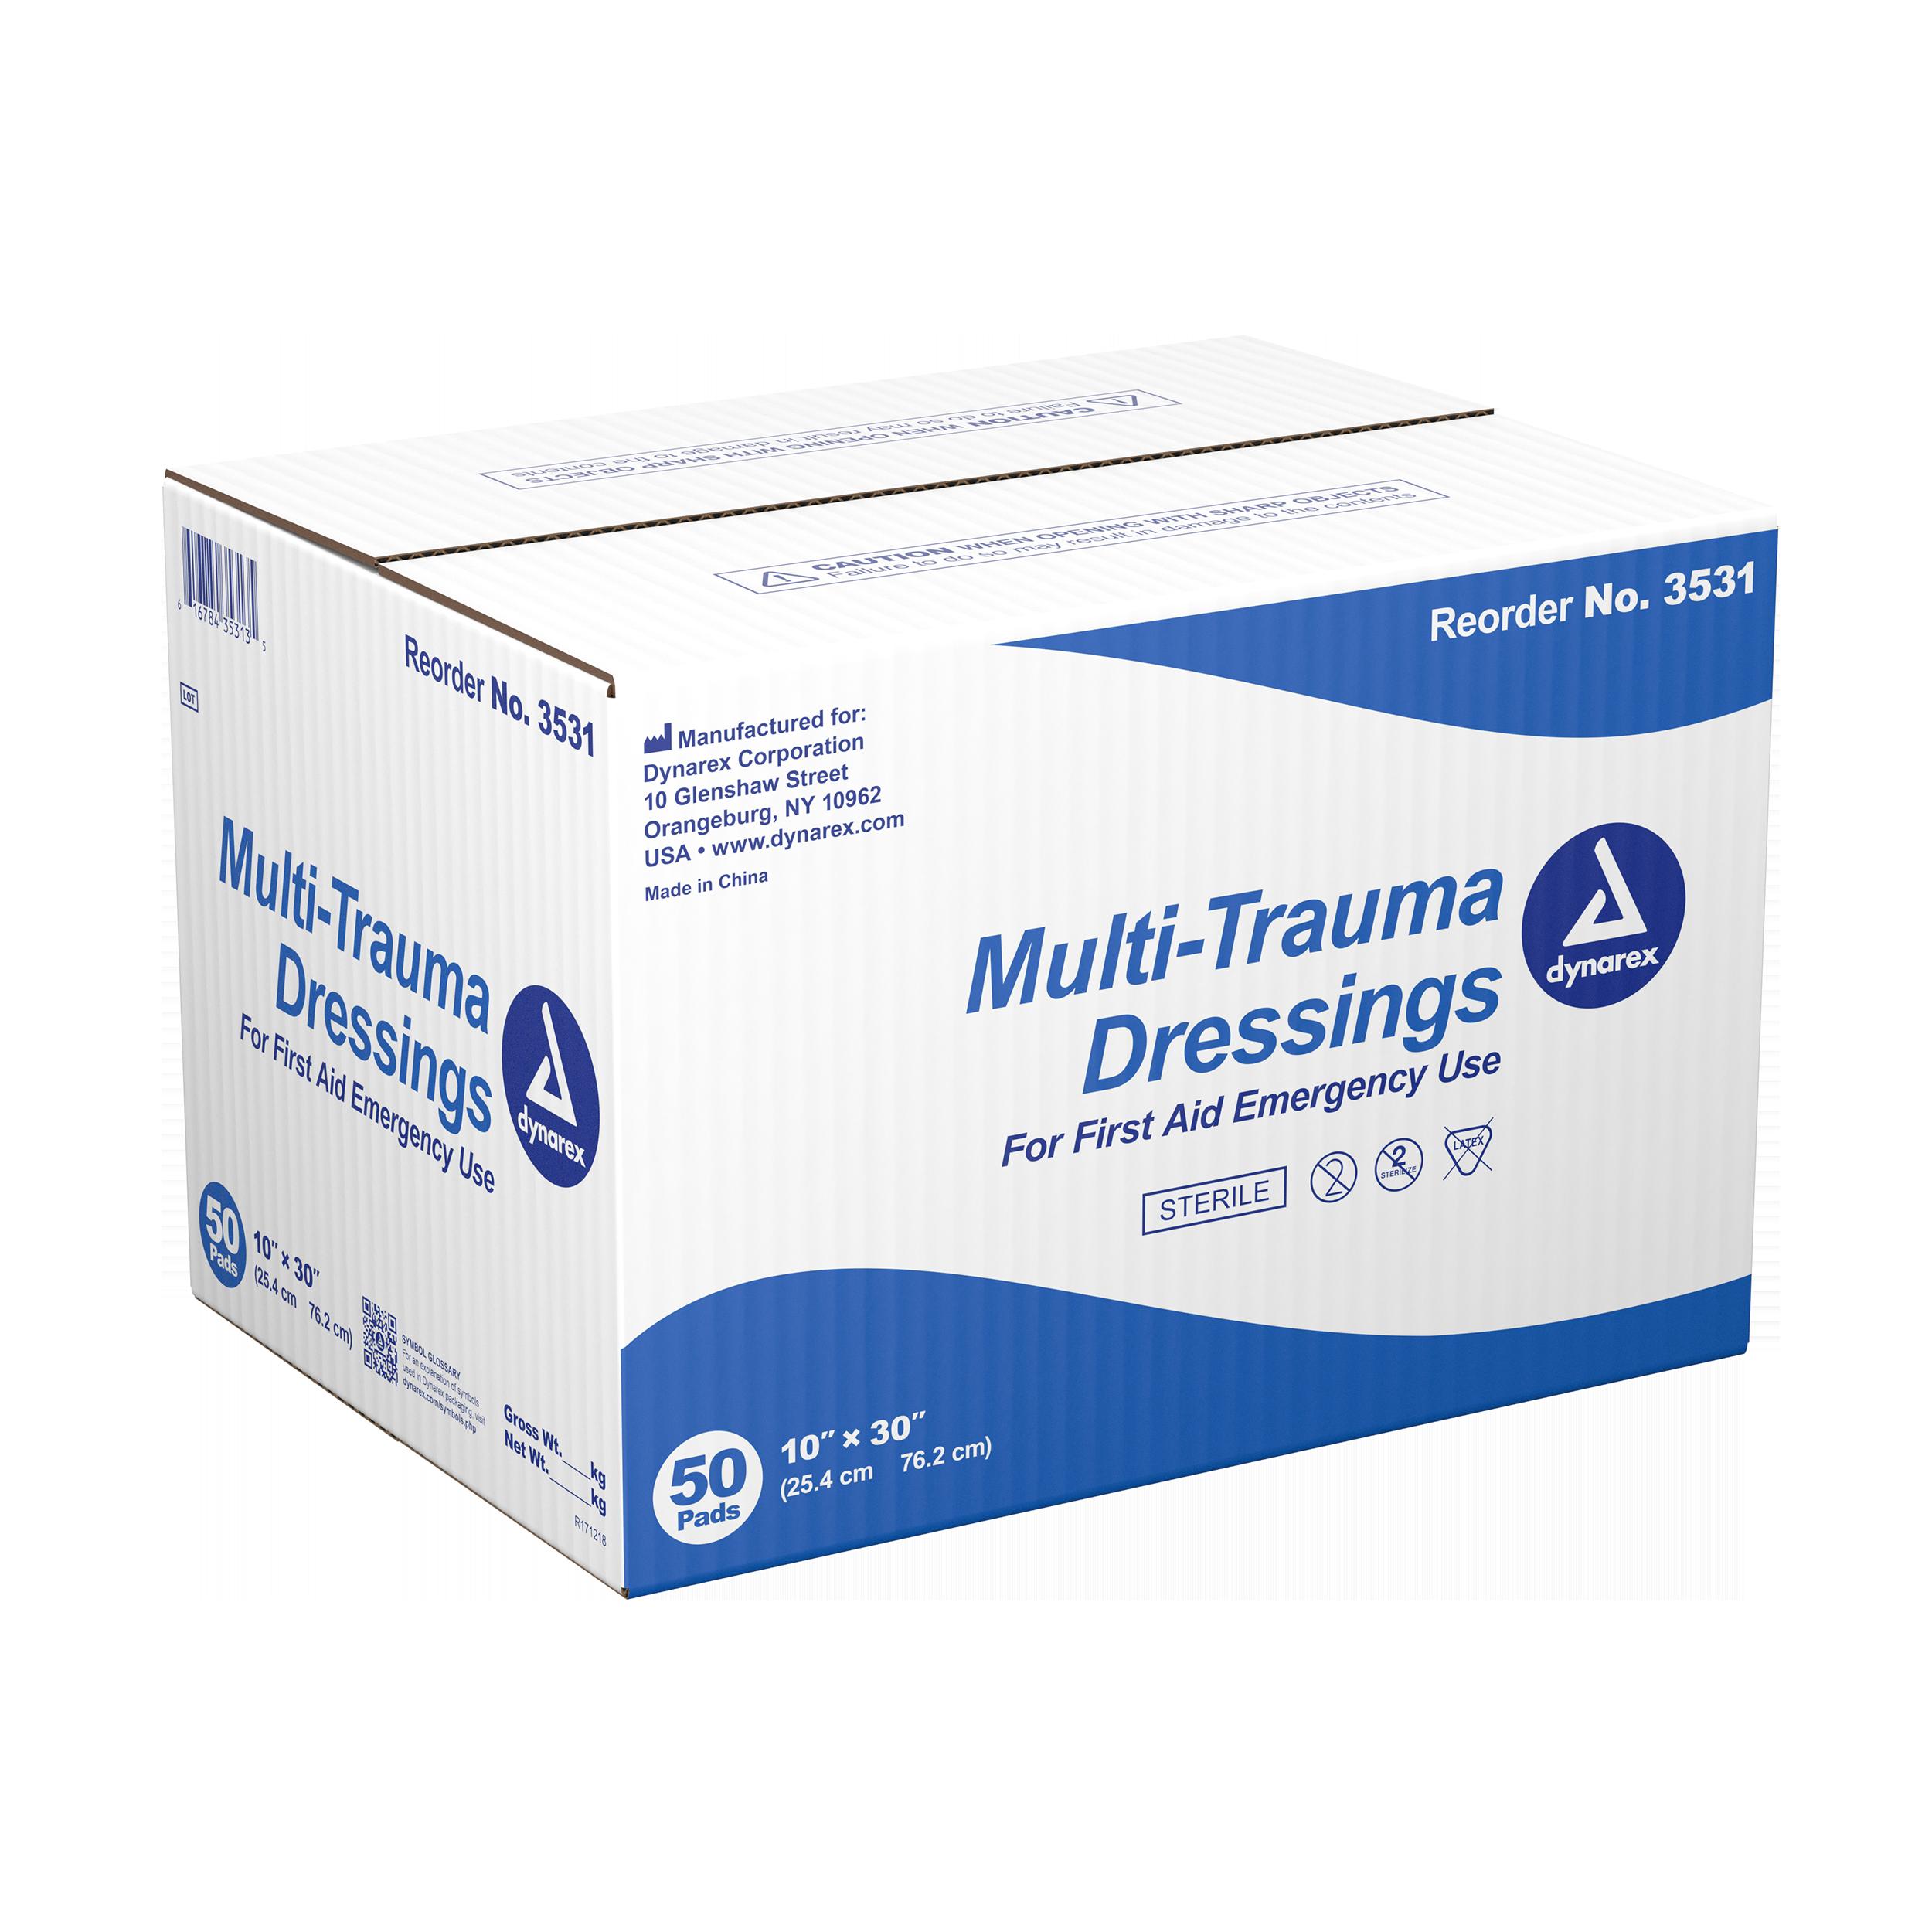 Multi-trauma Dressing Sterile - 10